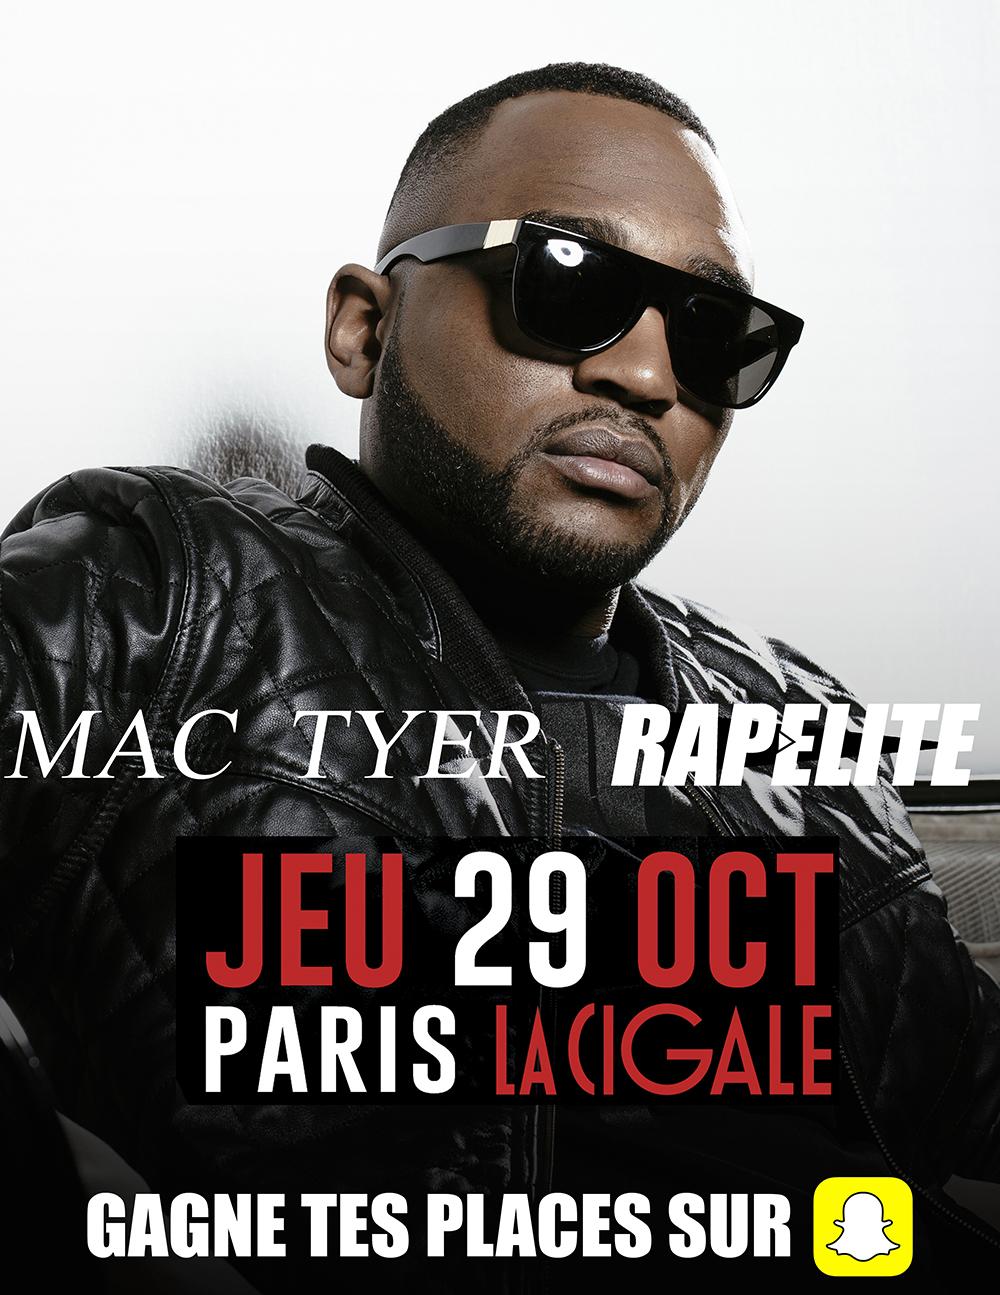 Mac Tyer - Concours